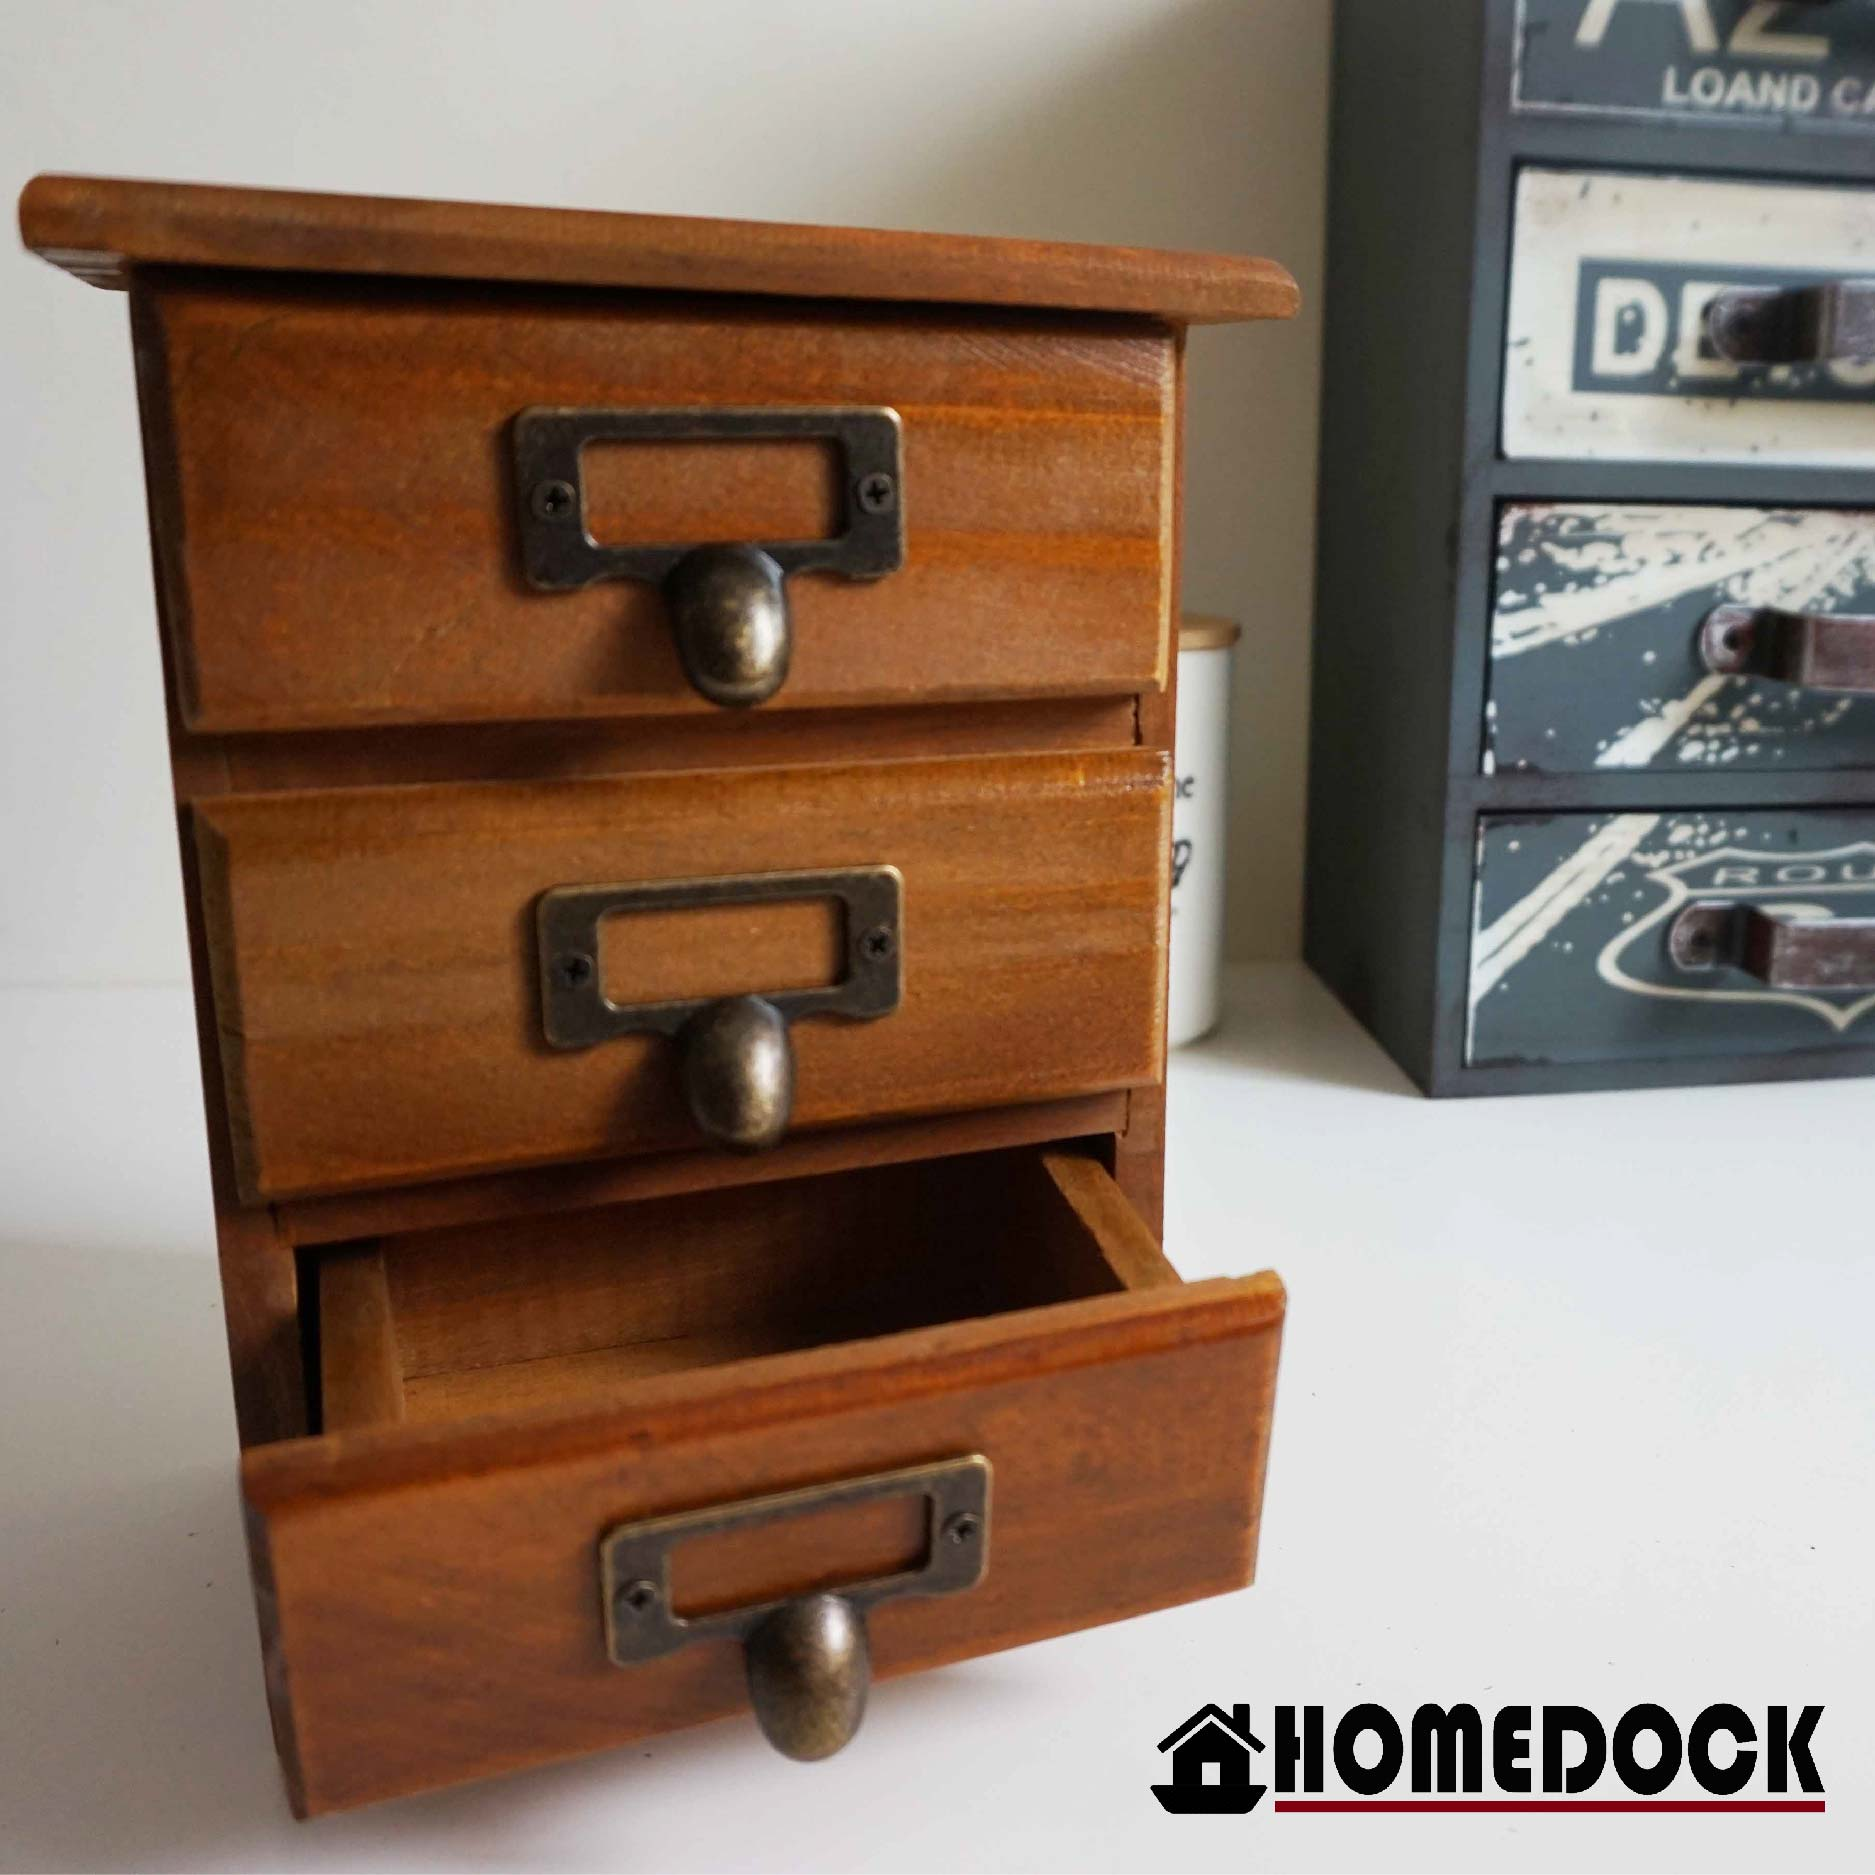 HOMEDOCK-原木質感3層小抽屜收納櫃 三層/三格/木櫃/置物櫃/原木製/層格櫃/抽屜/Zakka/木盒